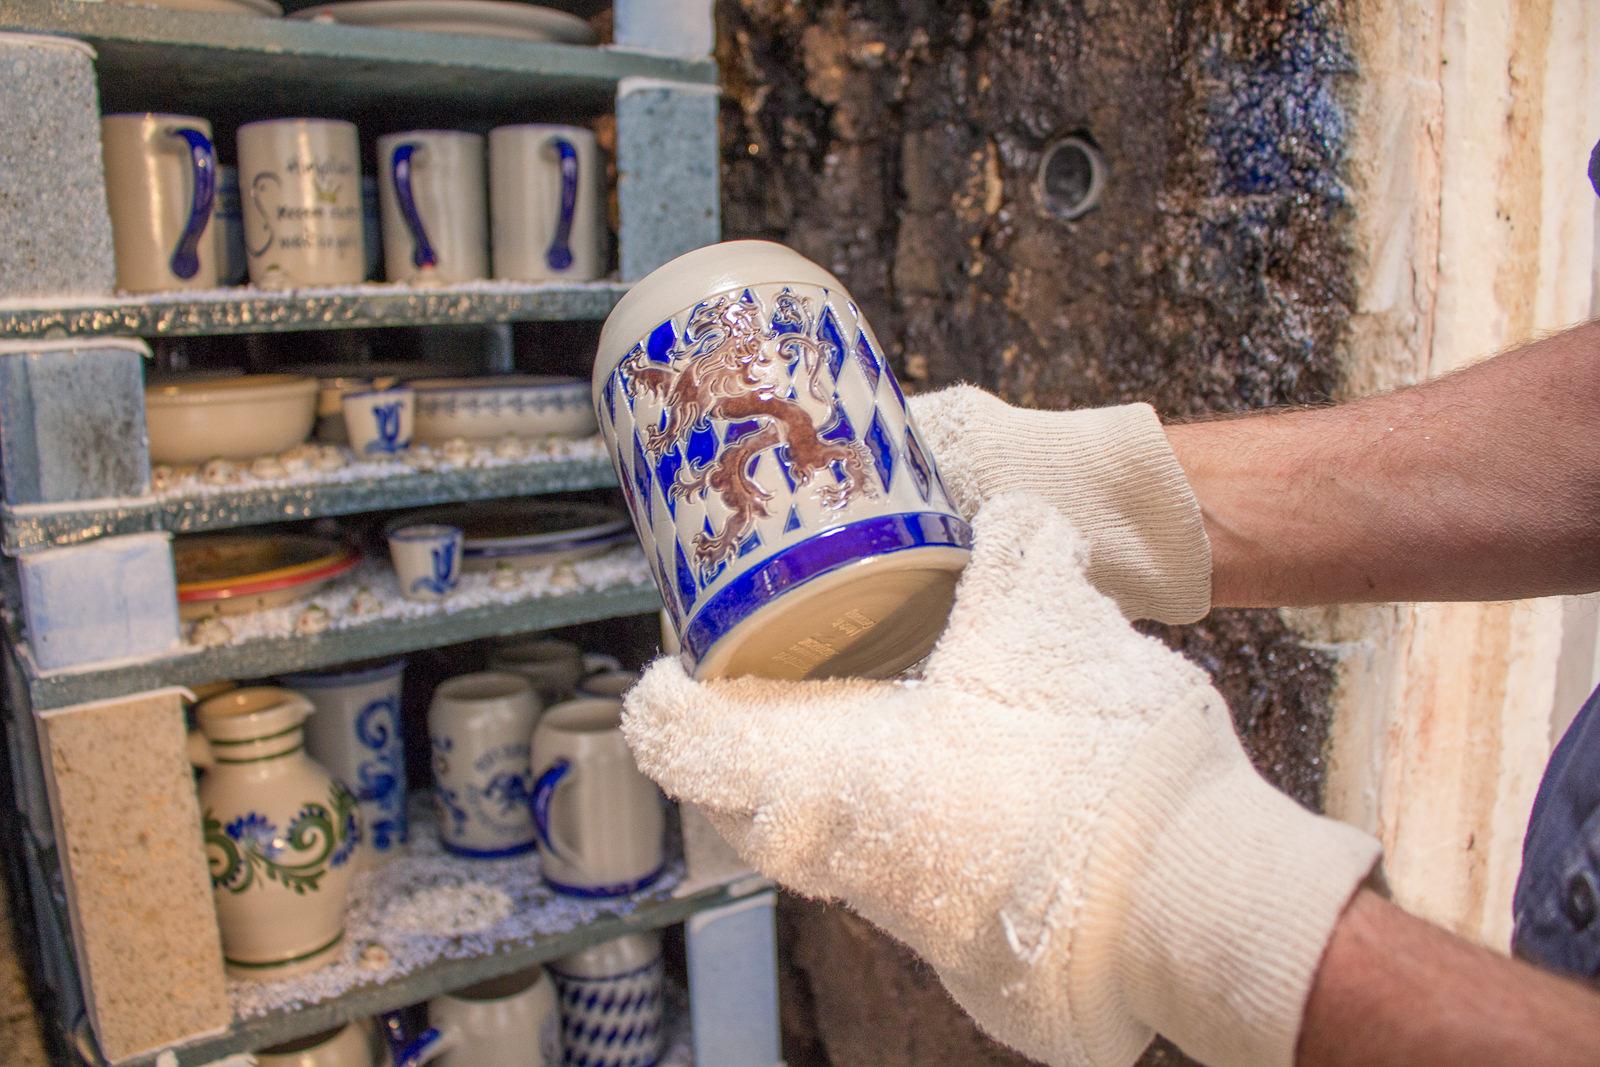 kannenbäckerland, #visitkeramik, Höhr-Grenzhausen, #RLPerleben, Ton, Keramik, Keramikkunst, Künstler, Manufaktur, Girmscheid Töpferei, Töpfern